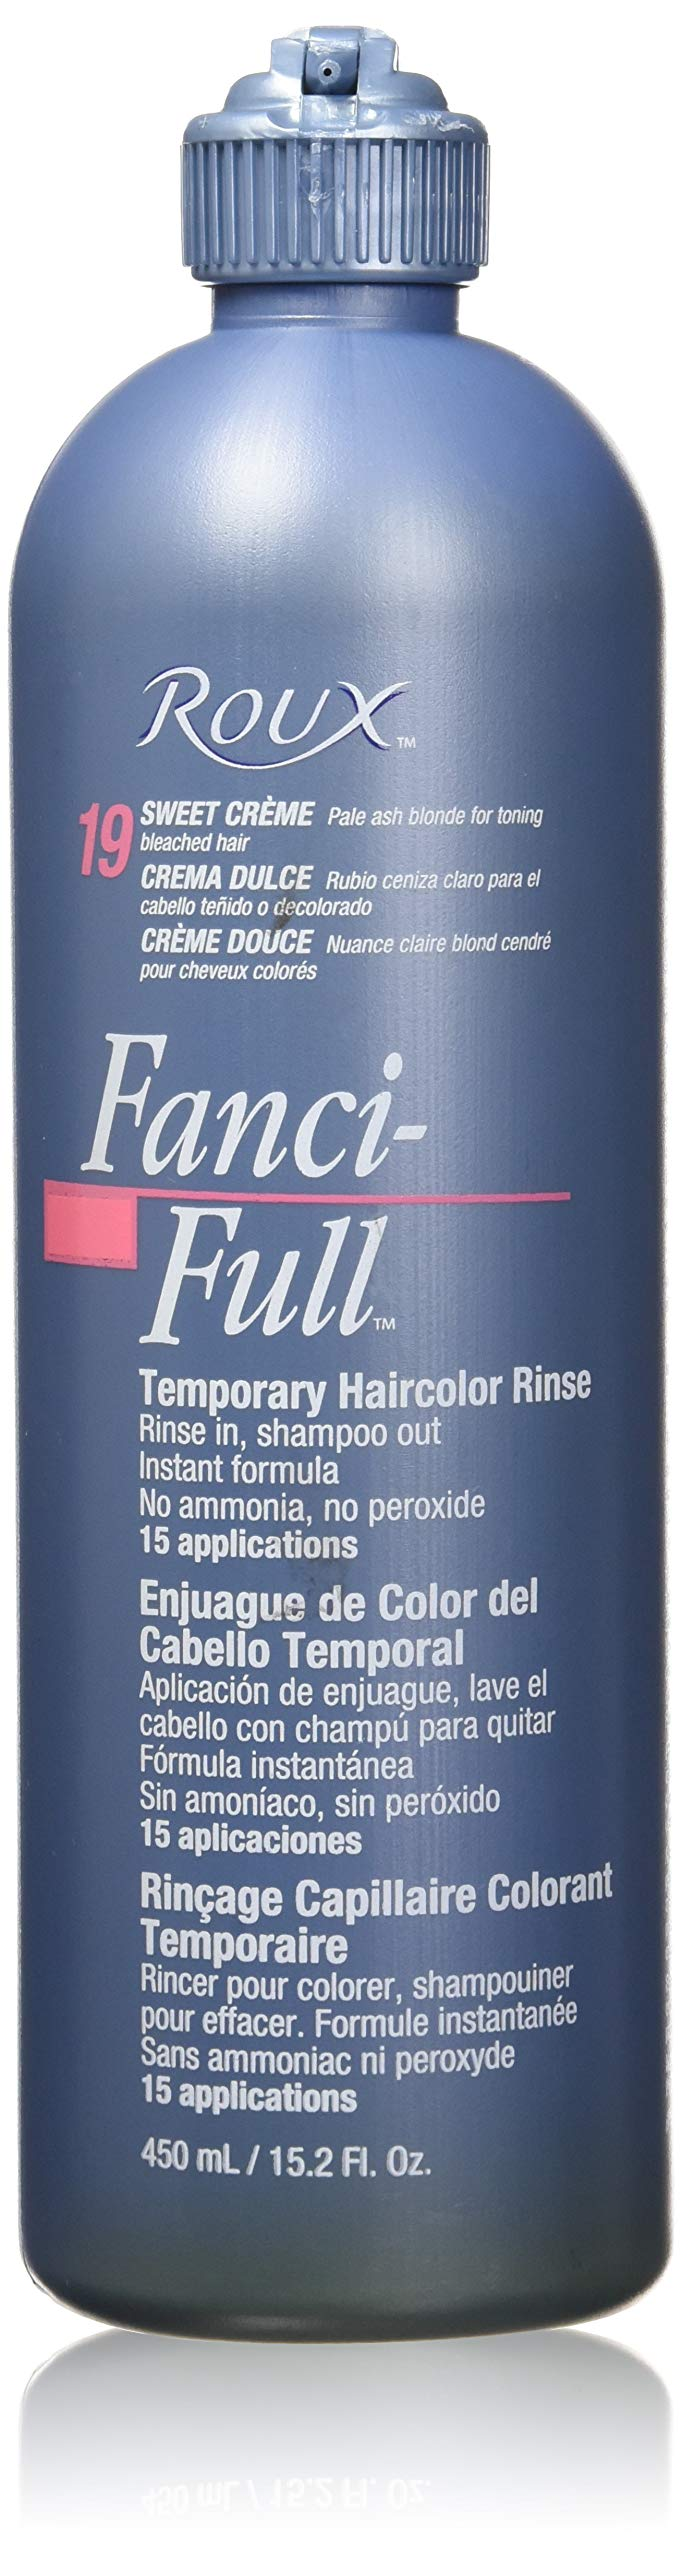 Roux Fanci-Full Rinse, 19 Sweet Cream, 15.2 Fluid Ounce